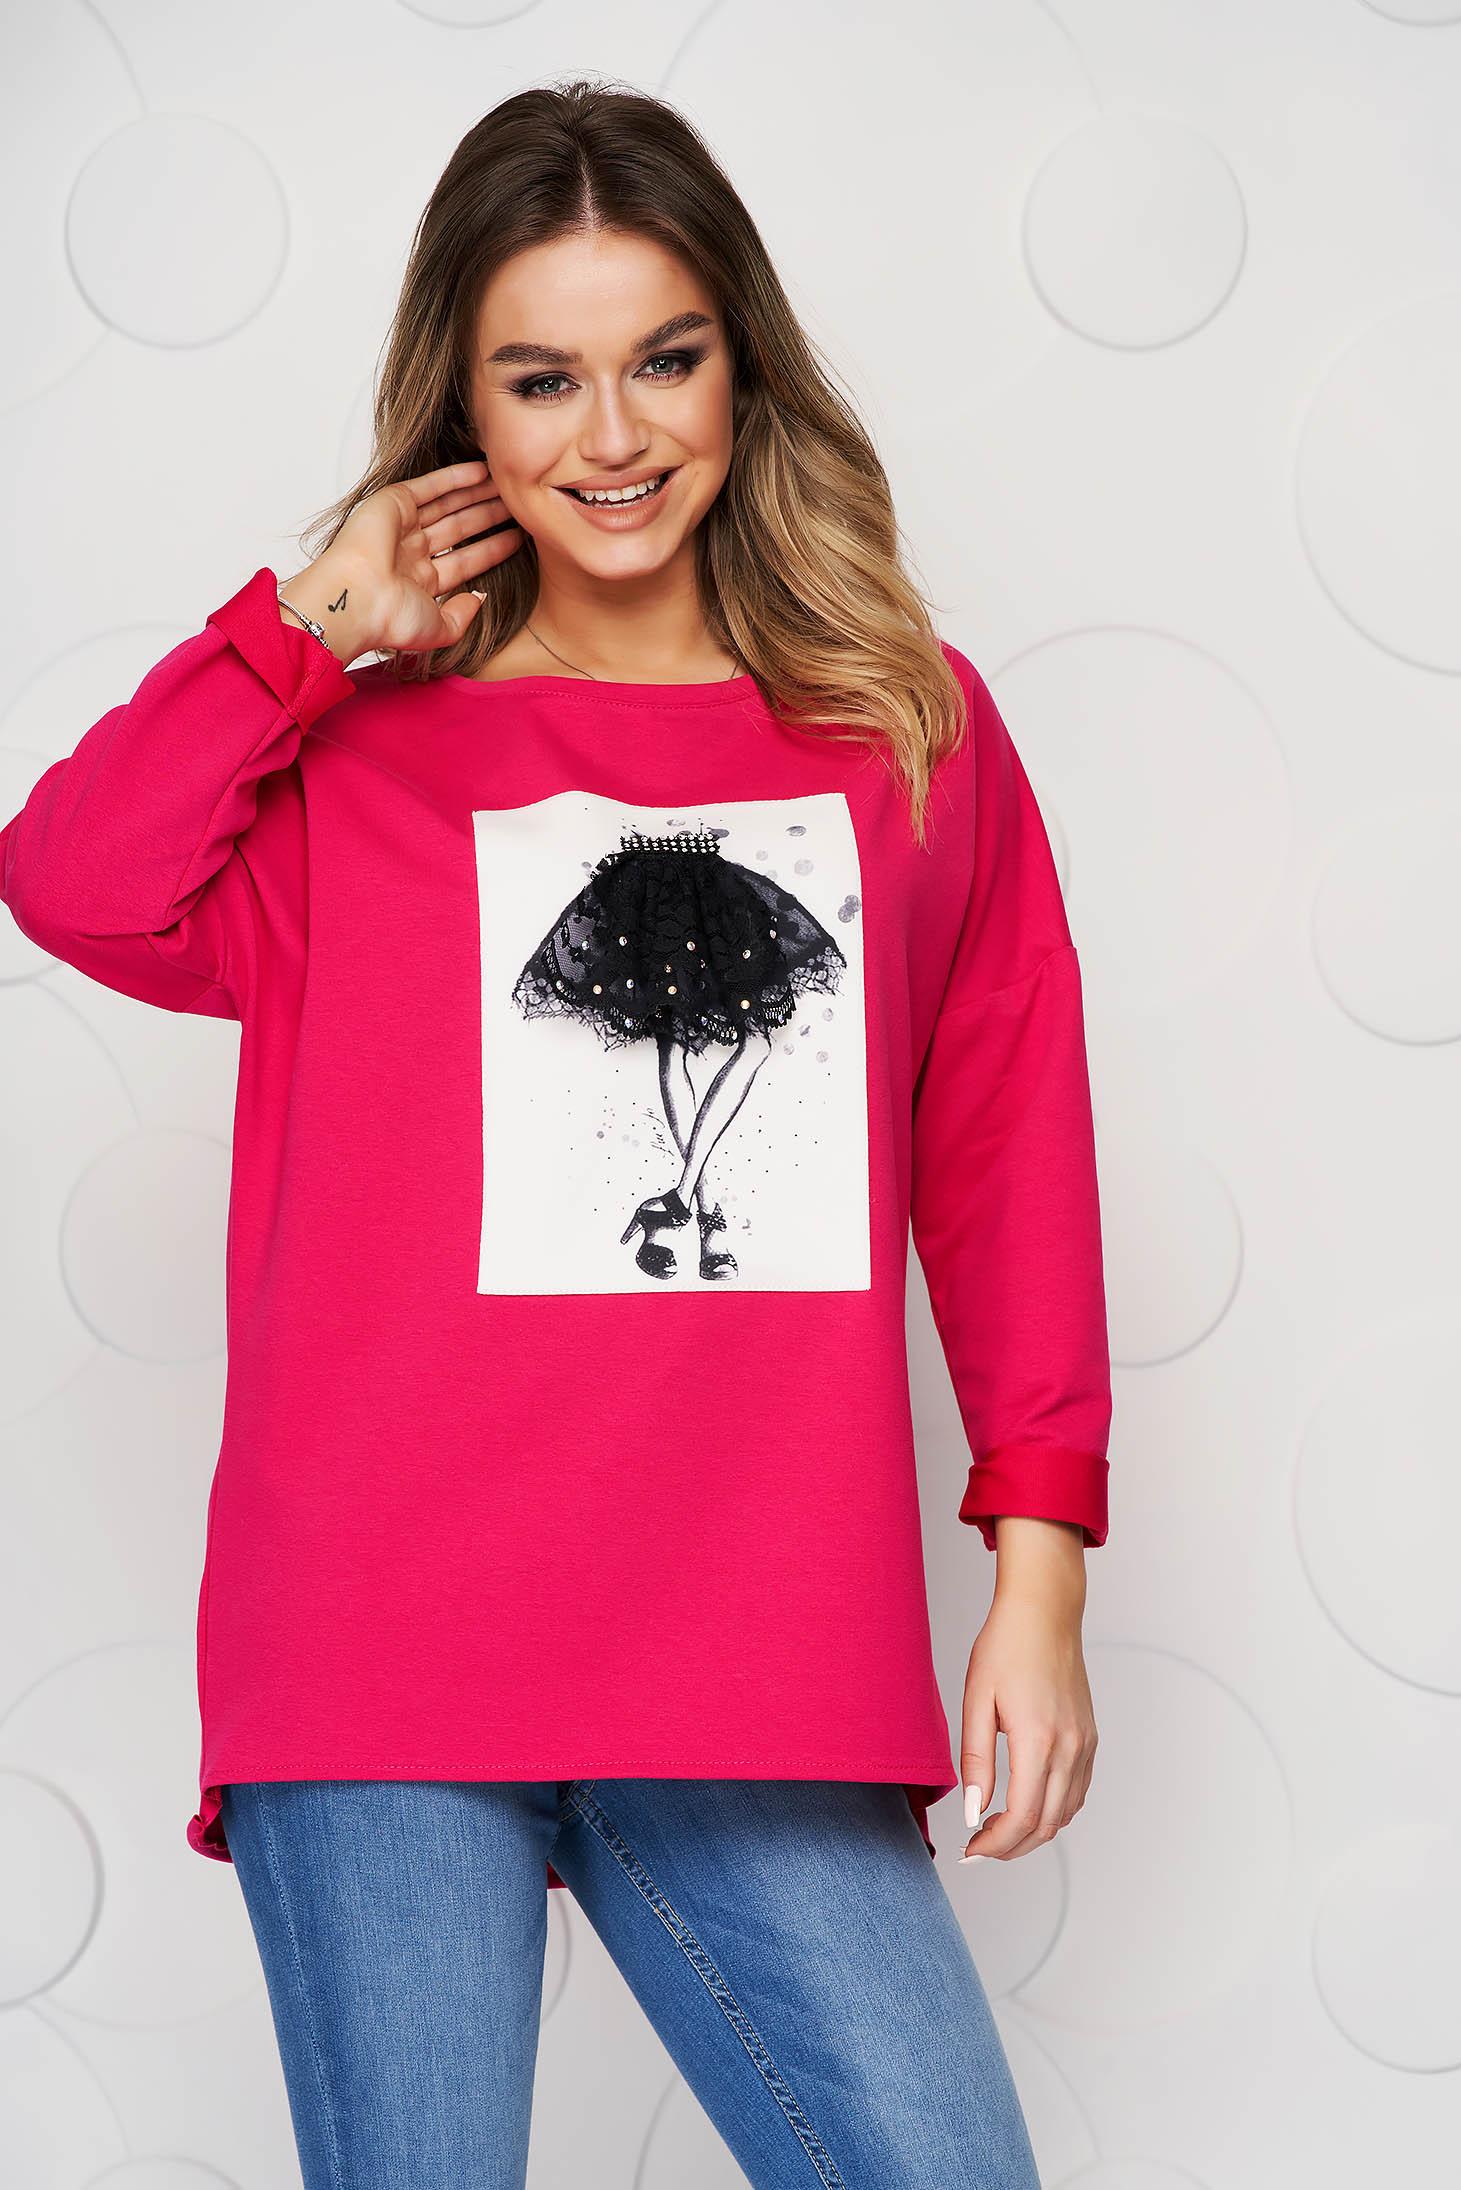 Bluza dama SunShine roz din bumbac elastic slit lateral cu imprimeuri grafice